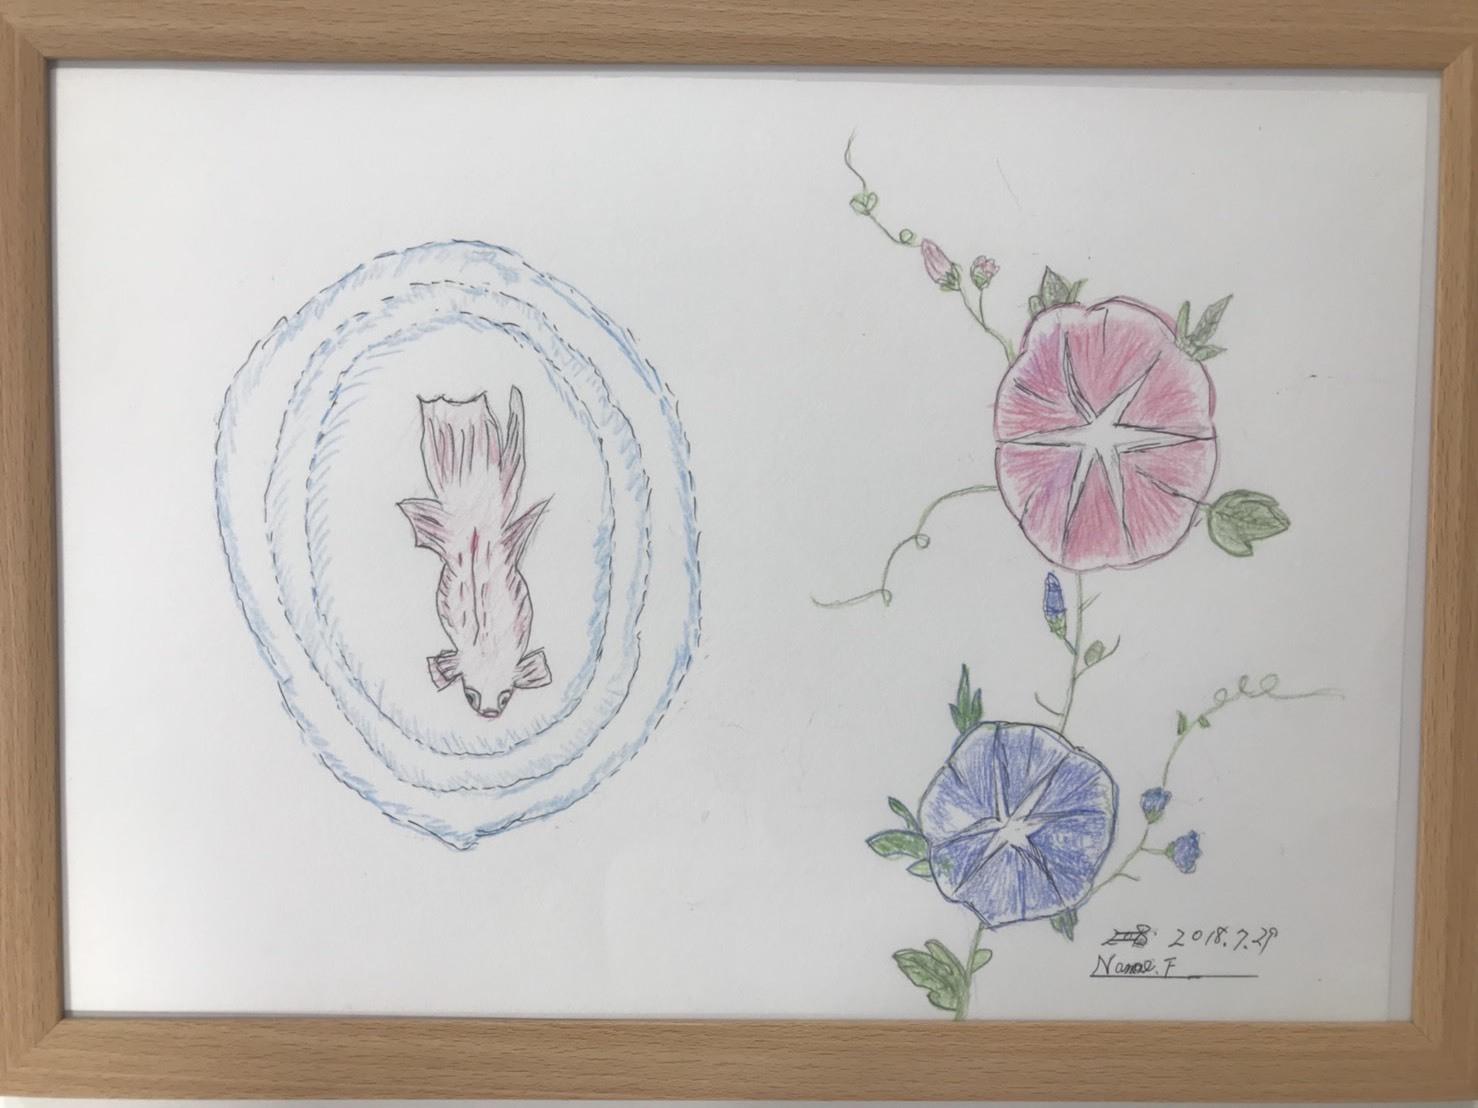 Nanaeギャラリー part36 〜朝顔&金魚〜_f0283066_17512355.jpg